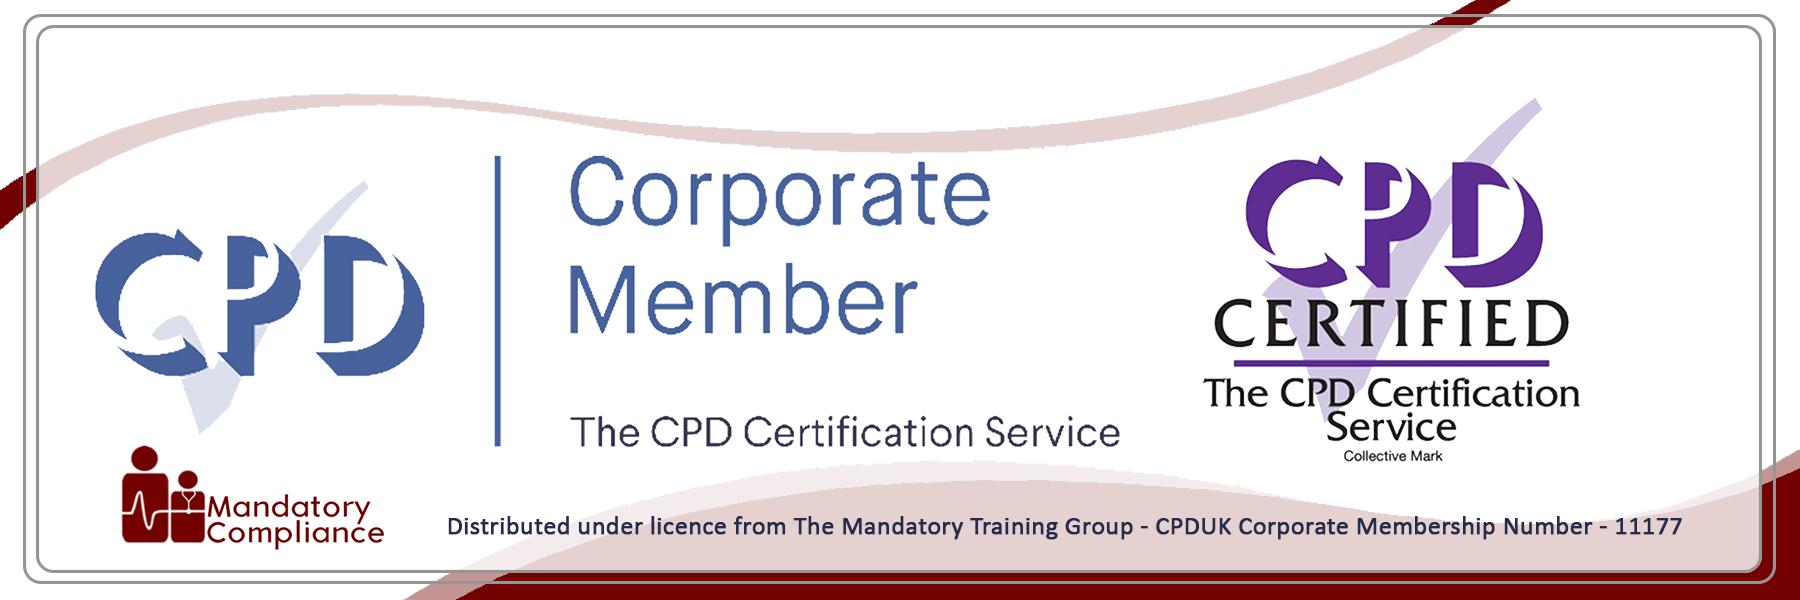 Learning Disability - Online Training Courses - Mandatory Compliance UK-